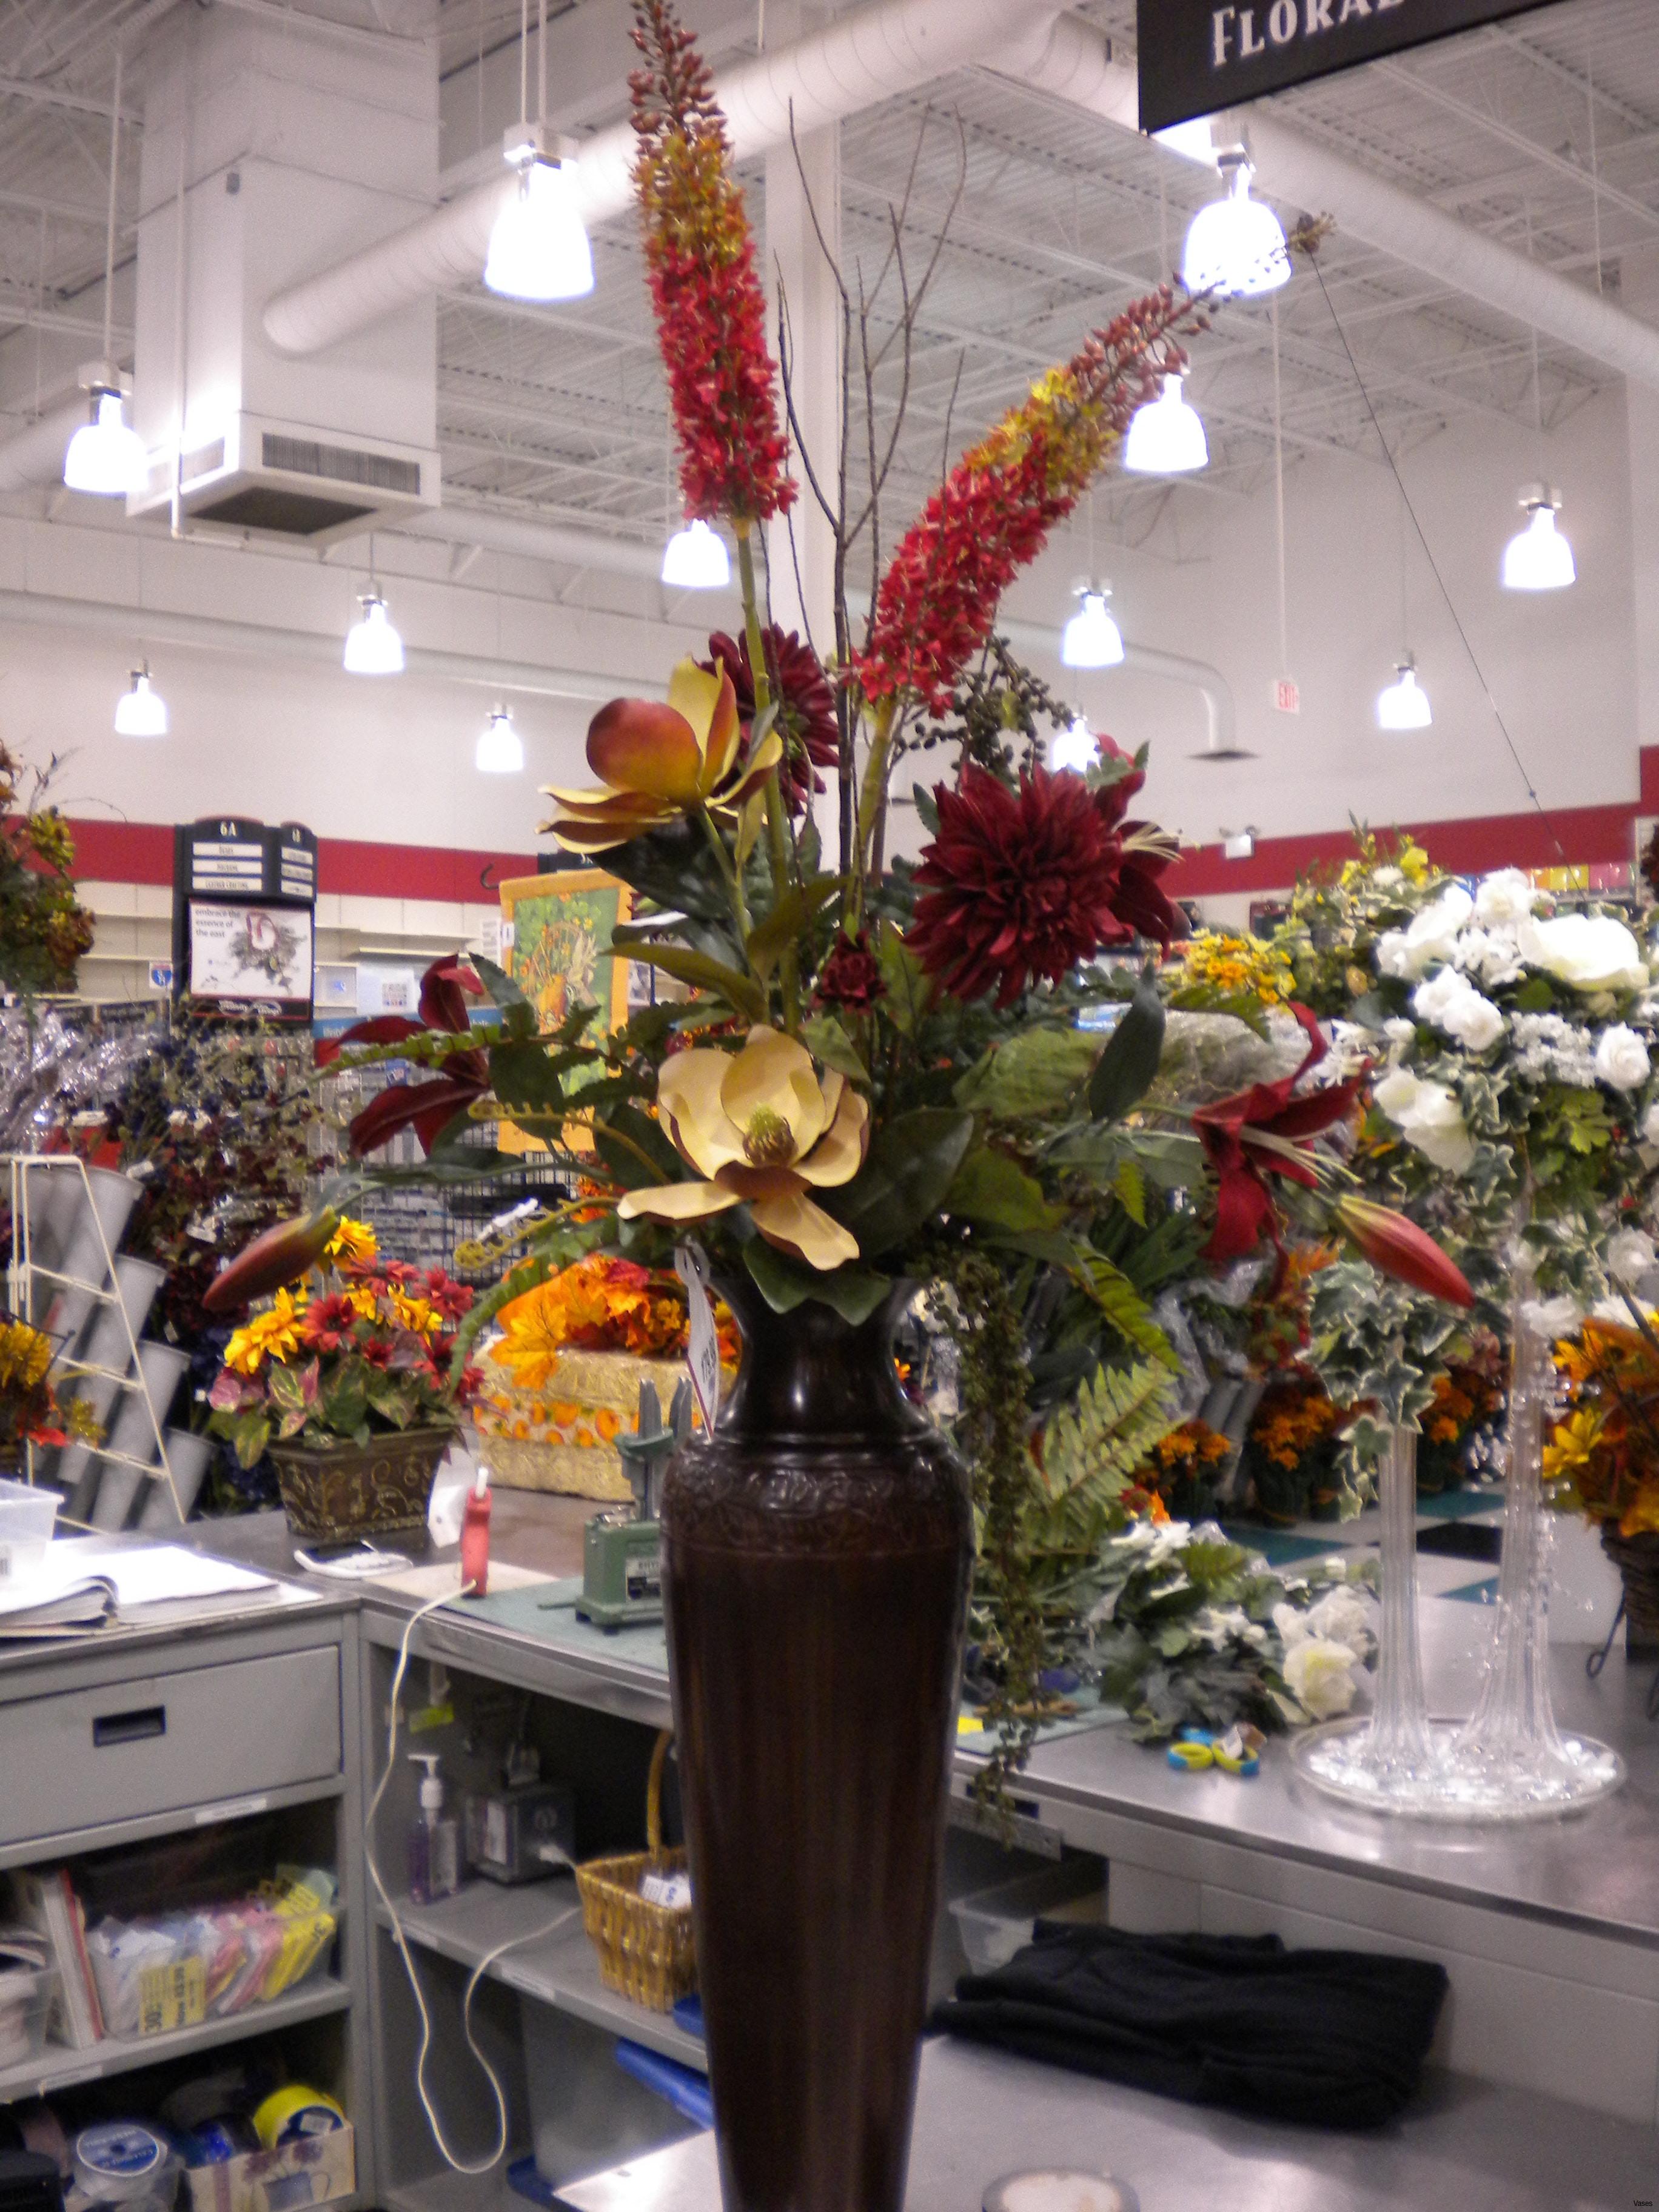 16 inch vase centerpieces of 10 fresh realistic fake flowers in vase bogekompresorturkiye com in h vases vase artificial flowers i 0d design ideas tall artificial design realistic faux flowers